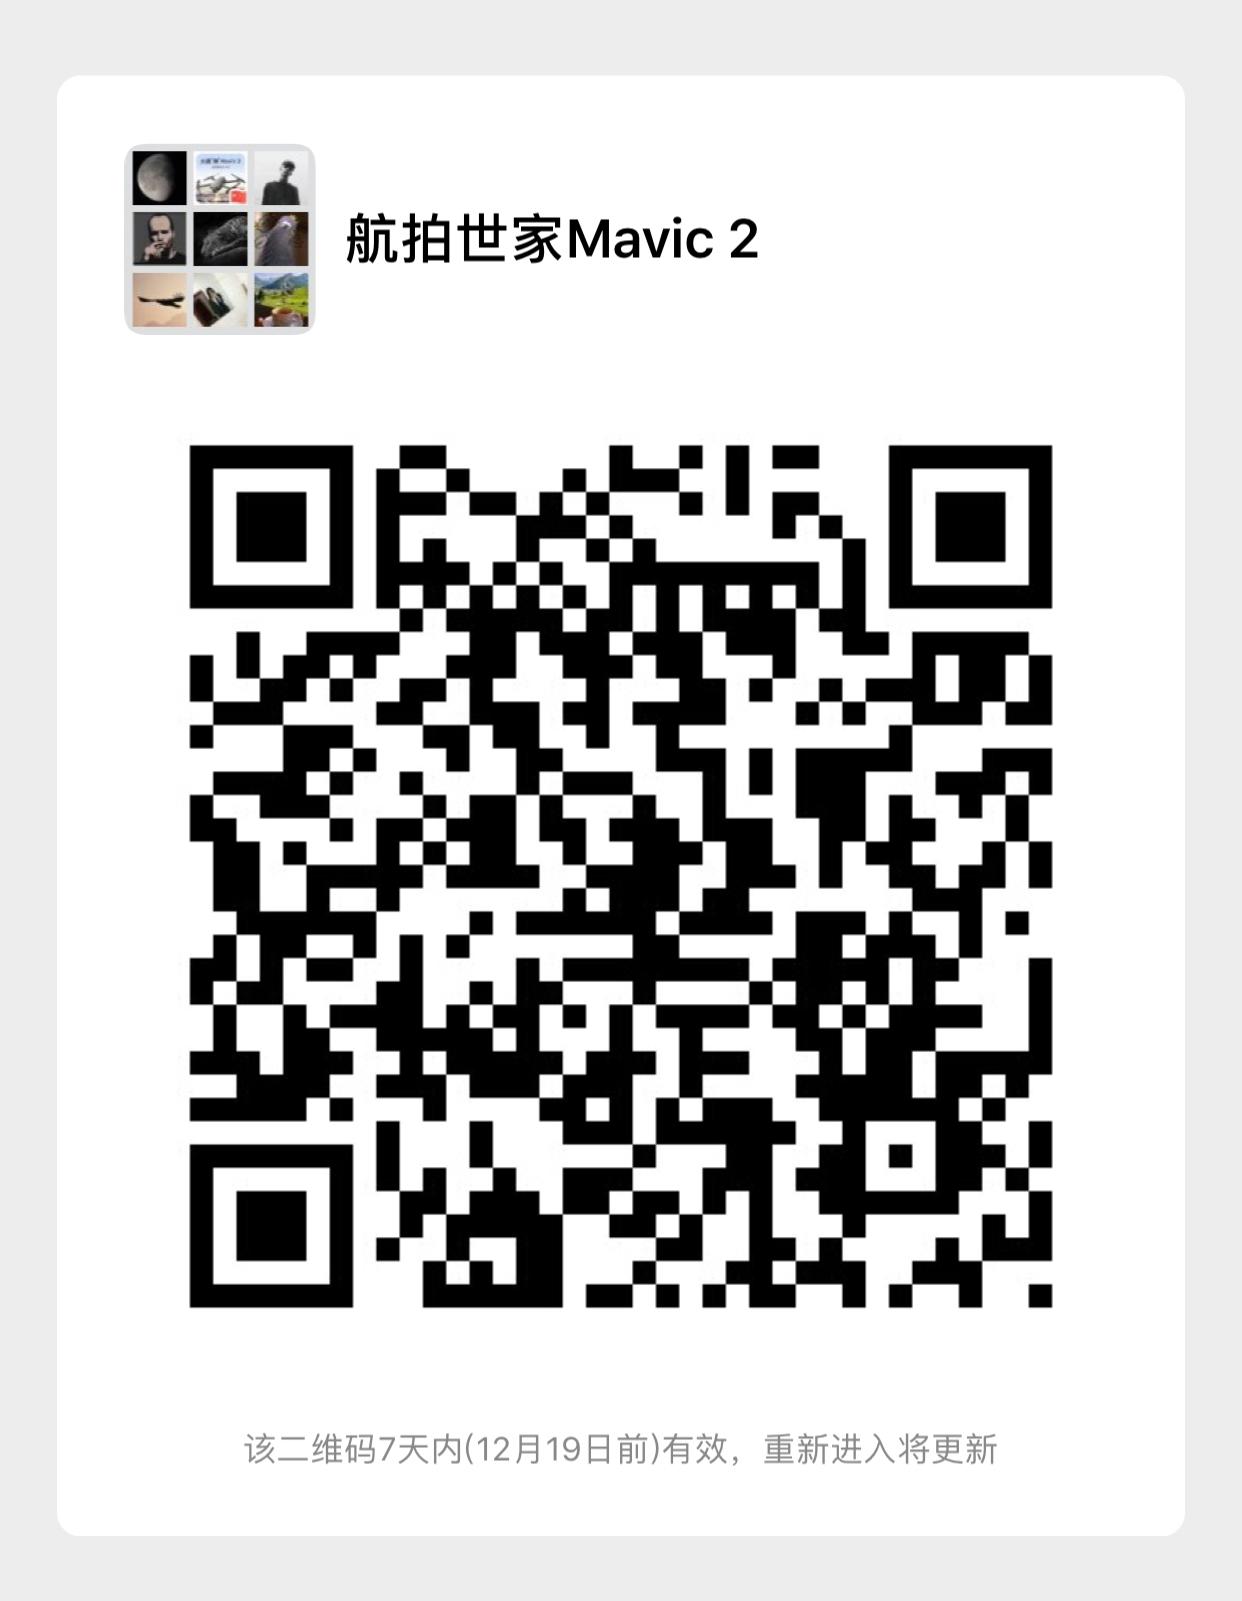 hangpaishijia-mavic2-org.jpg